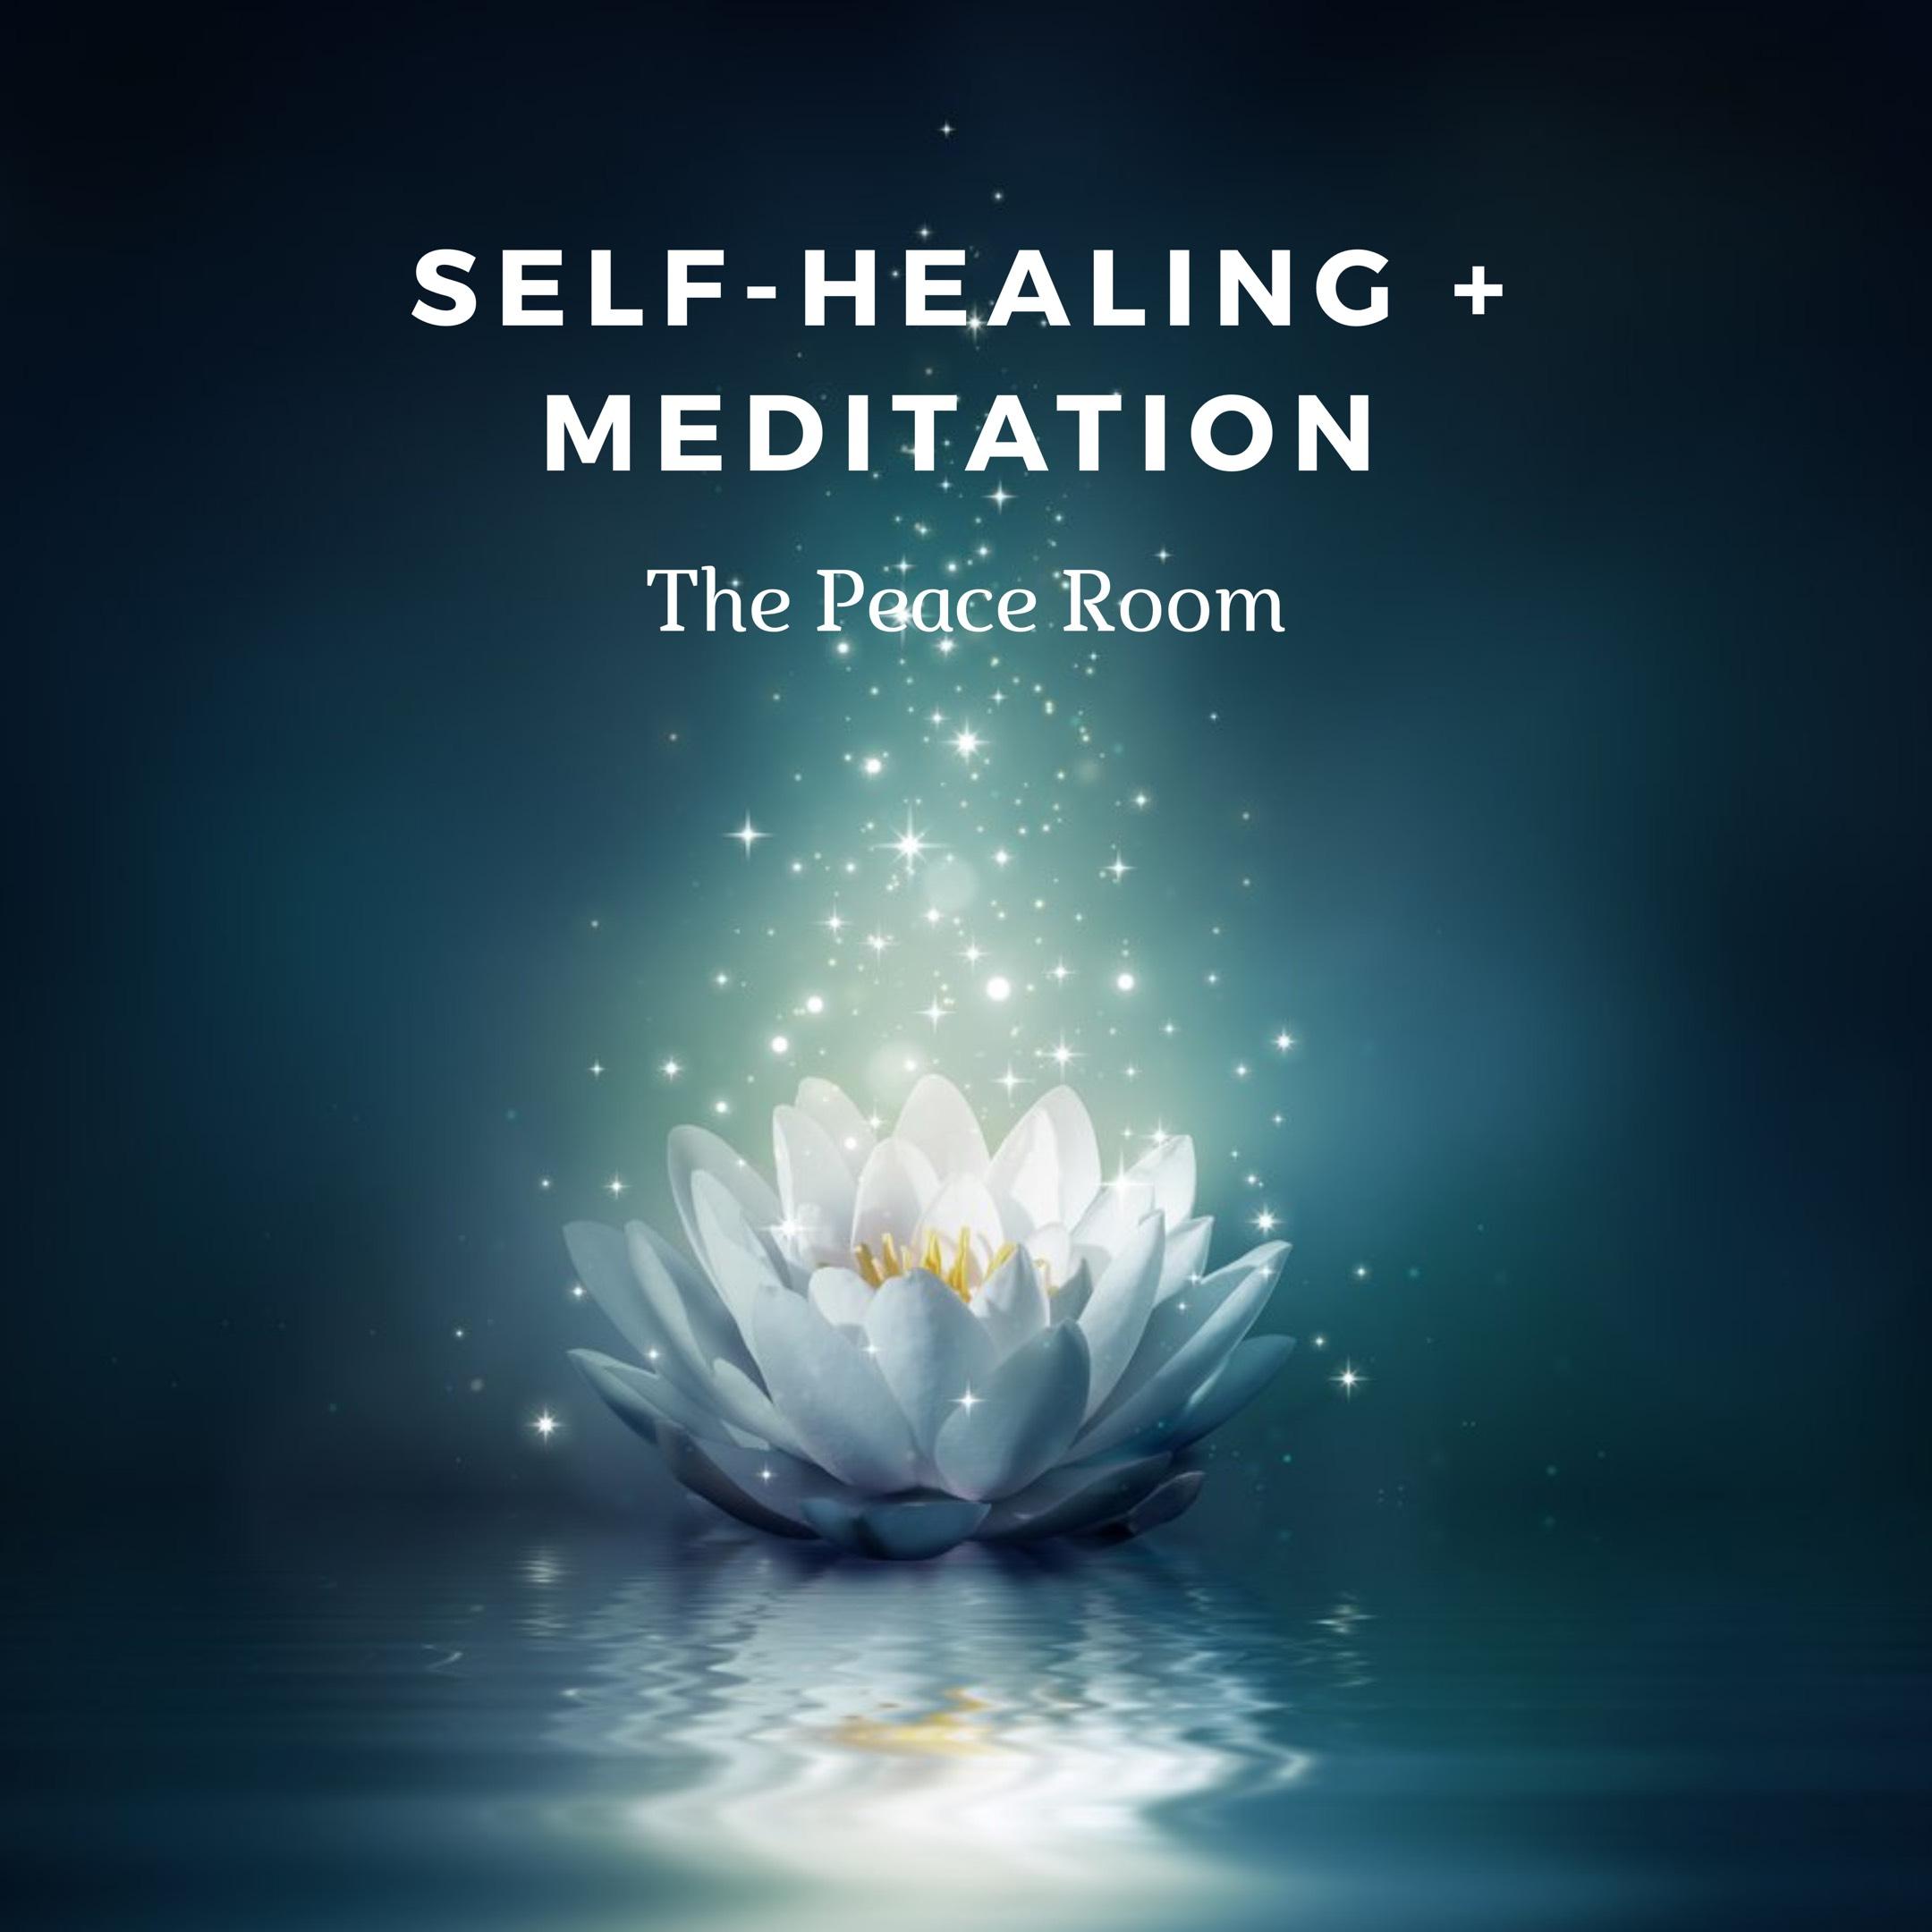 Self-healing + meditation.jpg